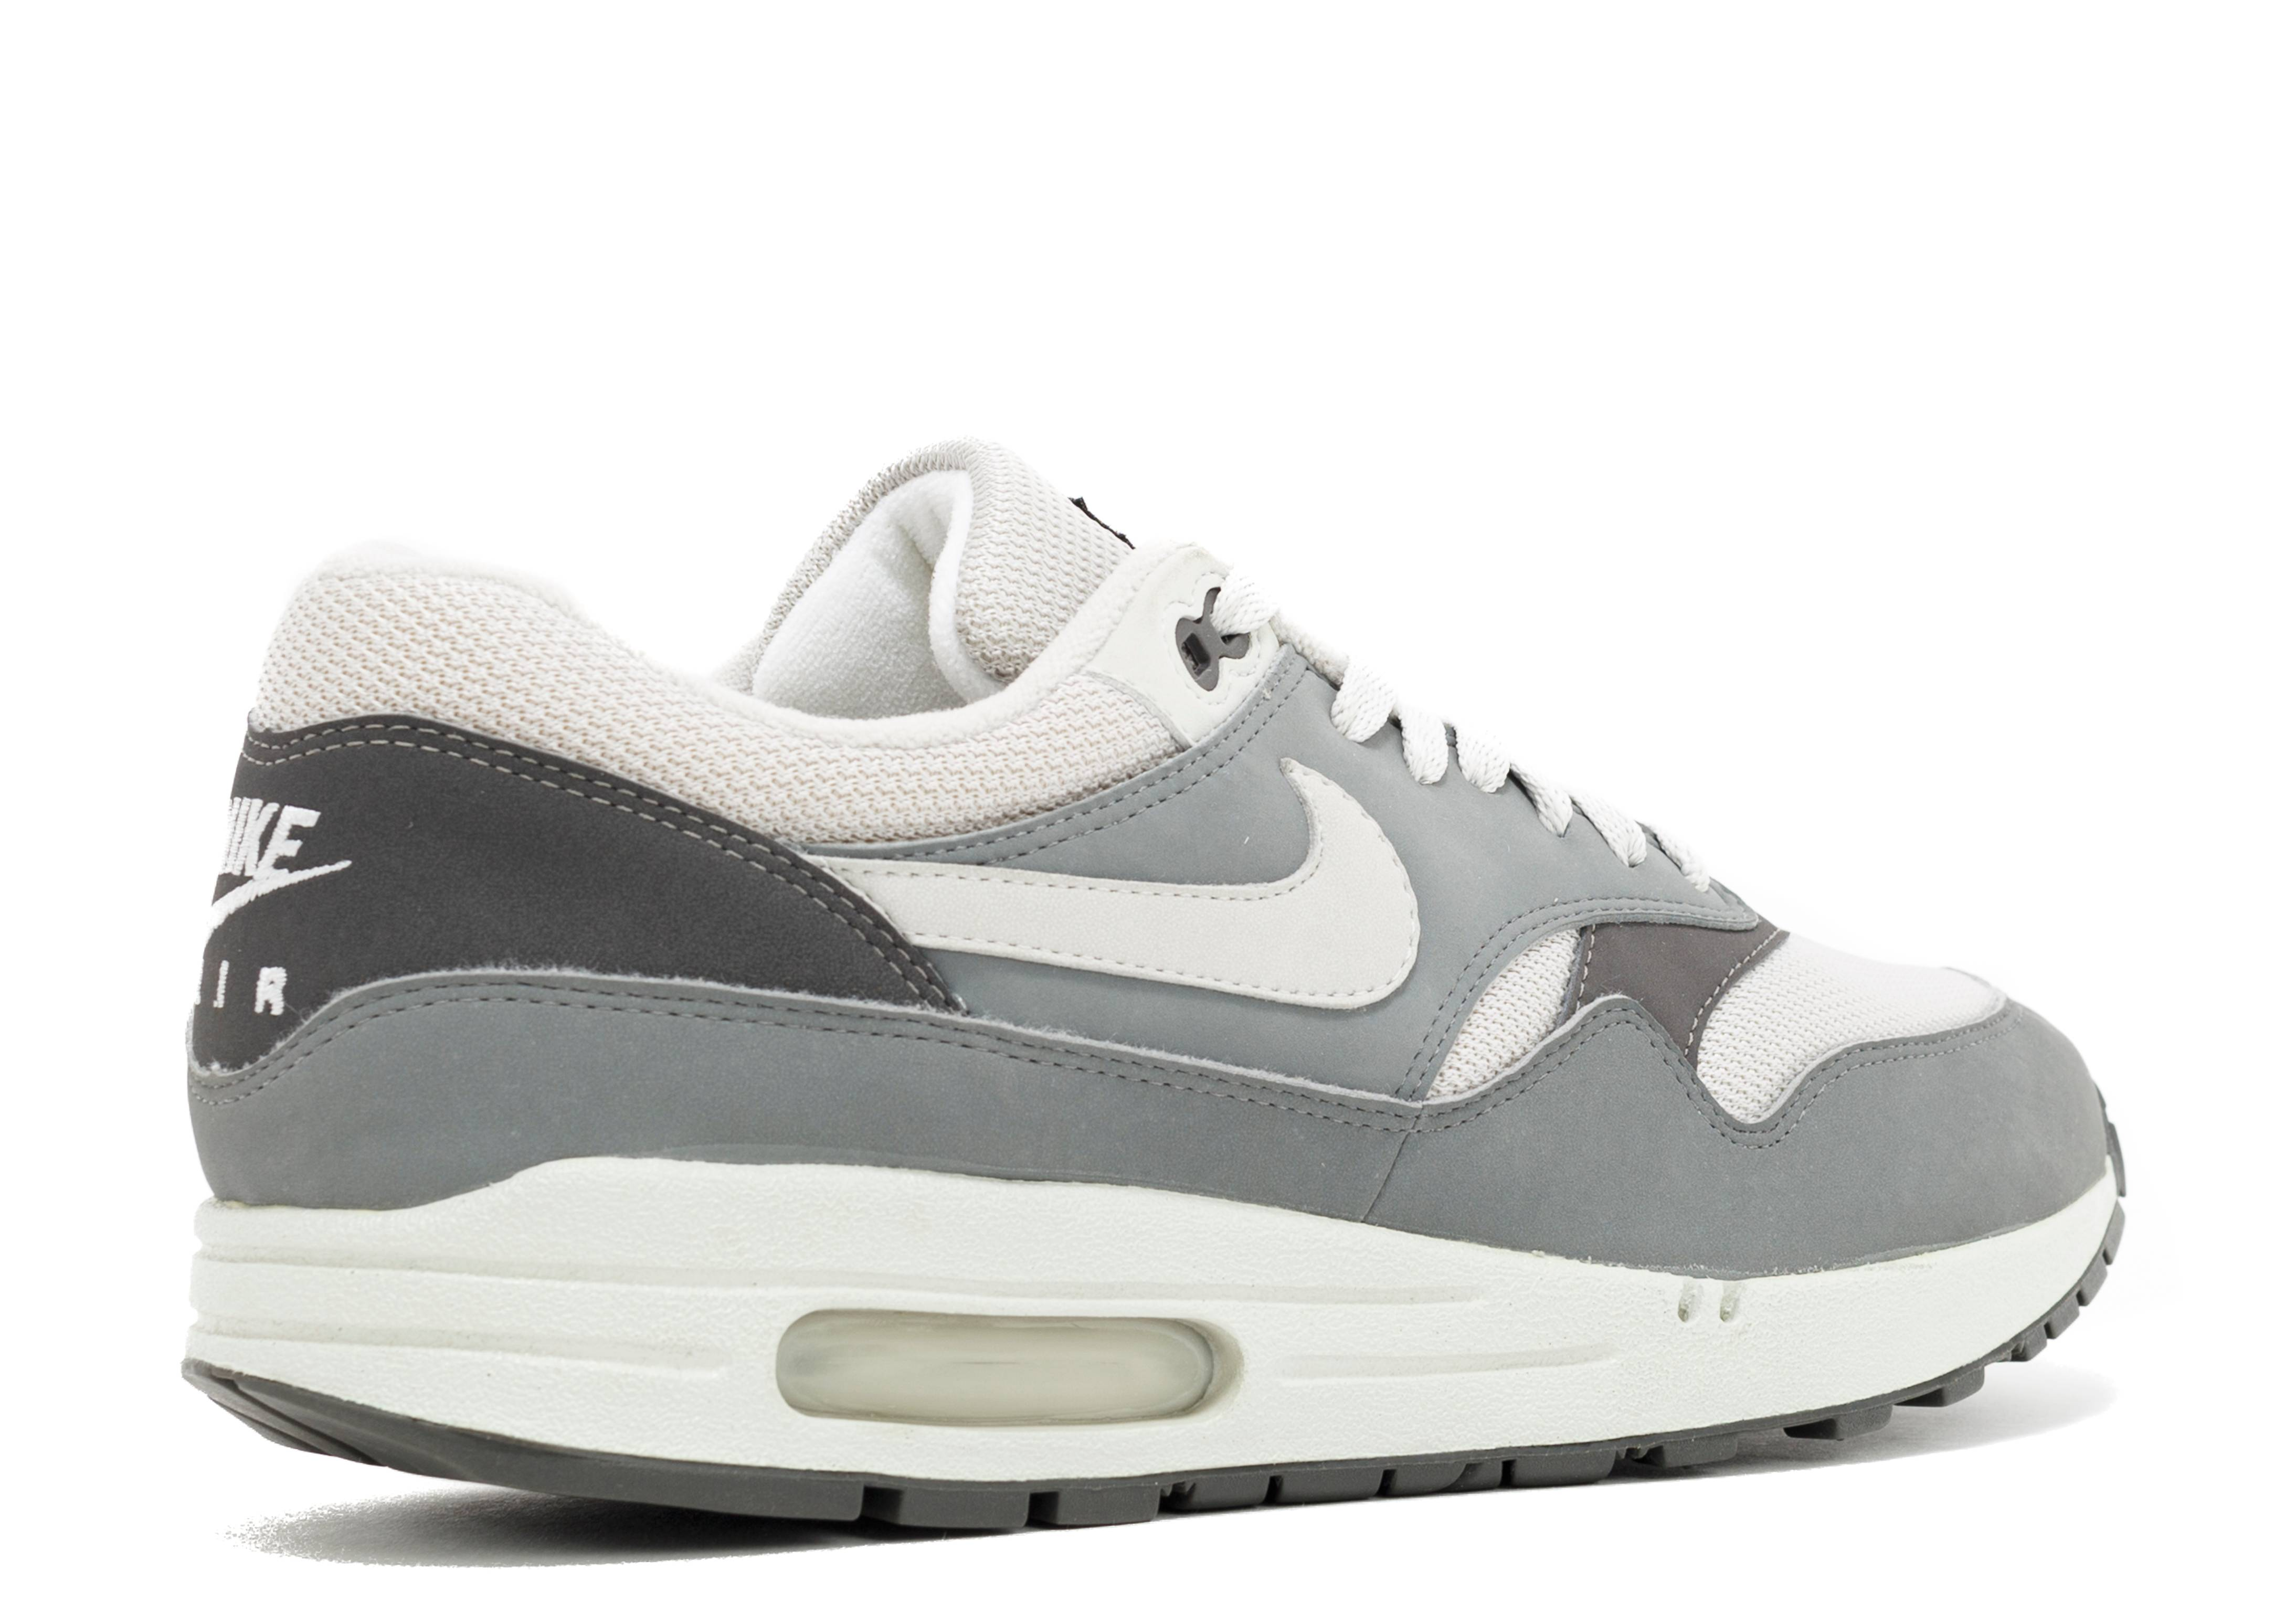 Nike Air Max 1 Grey Ones  d56d43861546